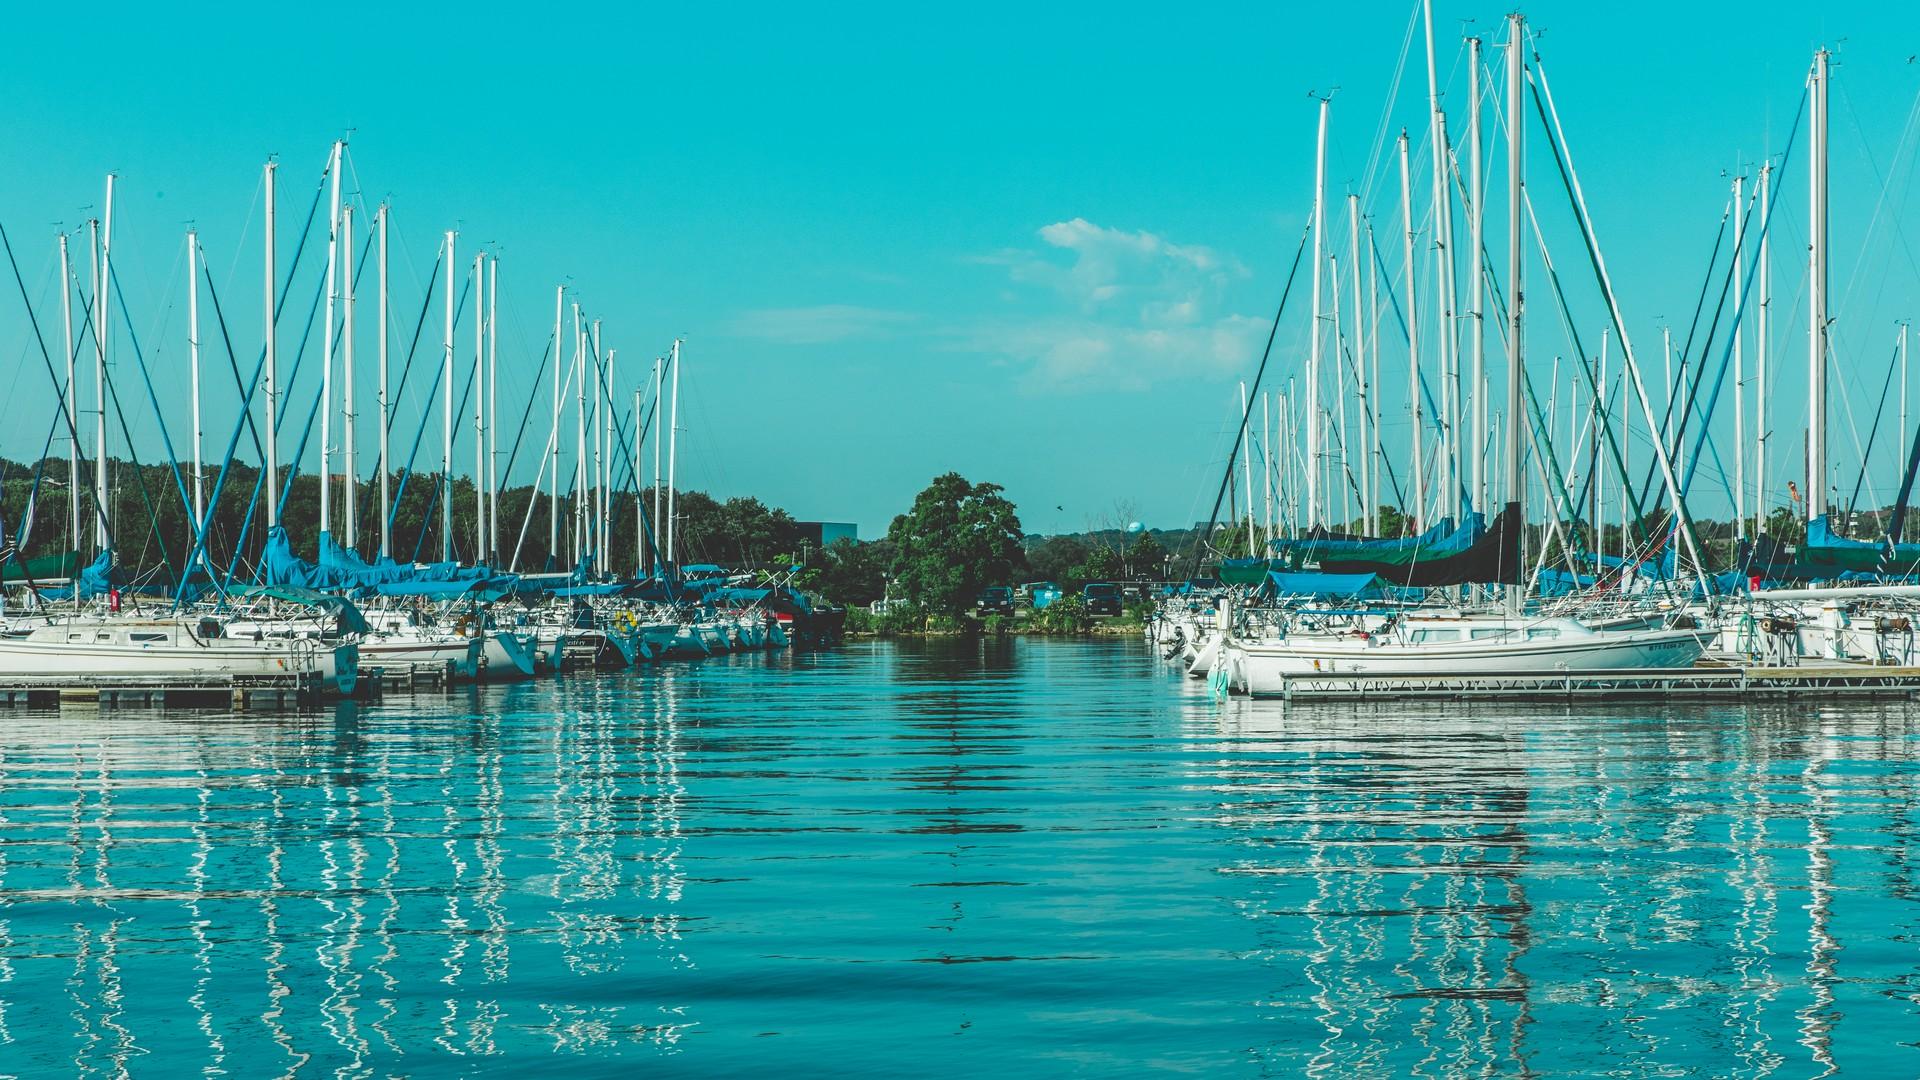 Sailboat-service-lake-travis.jpg